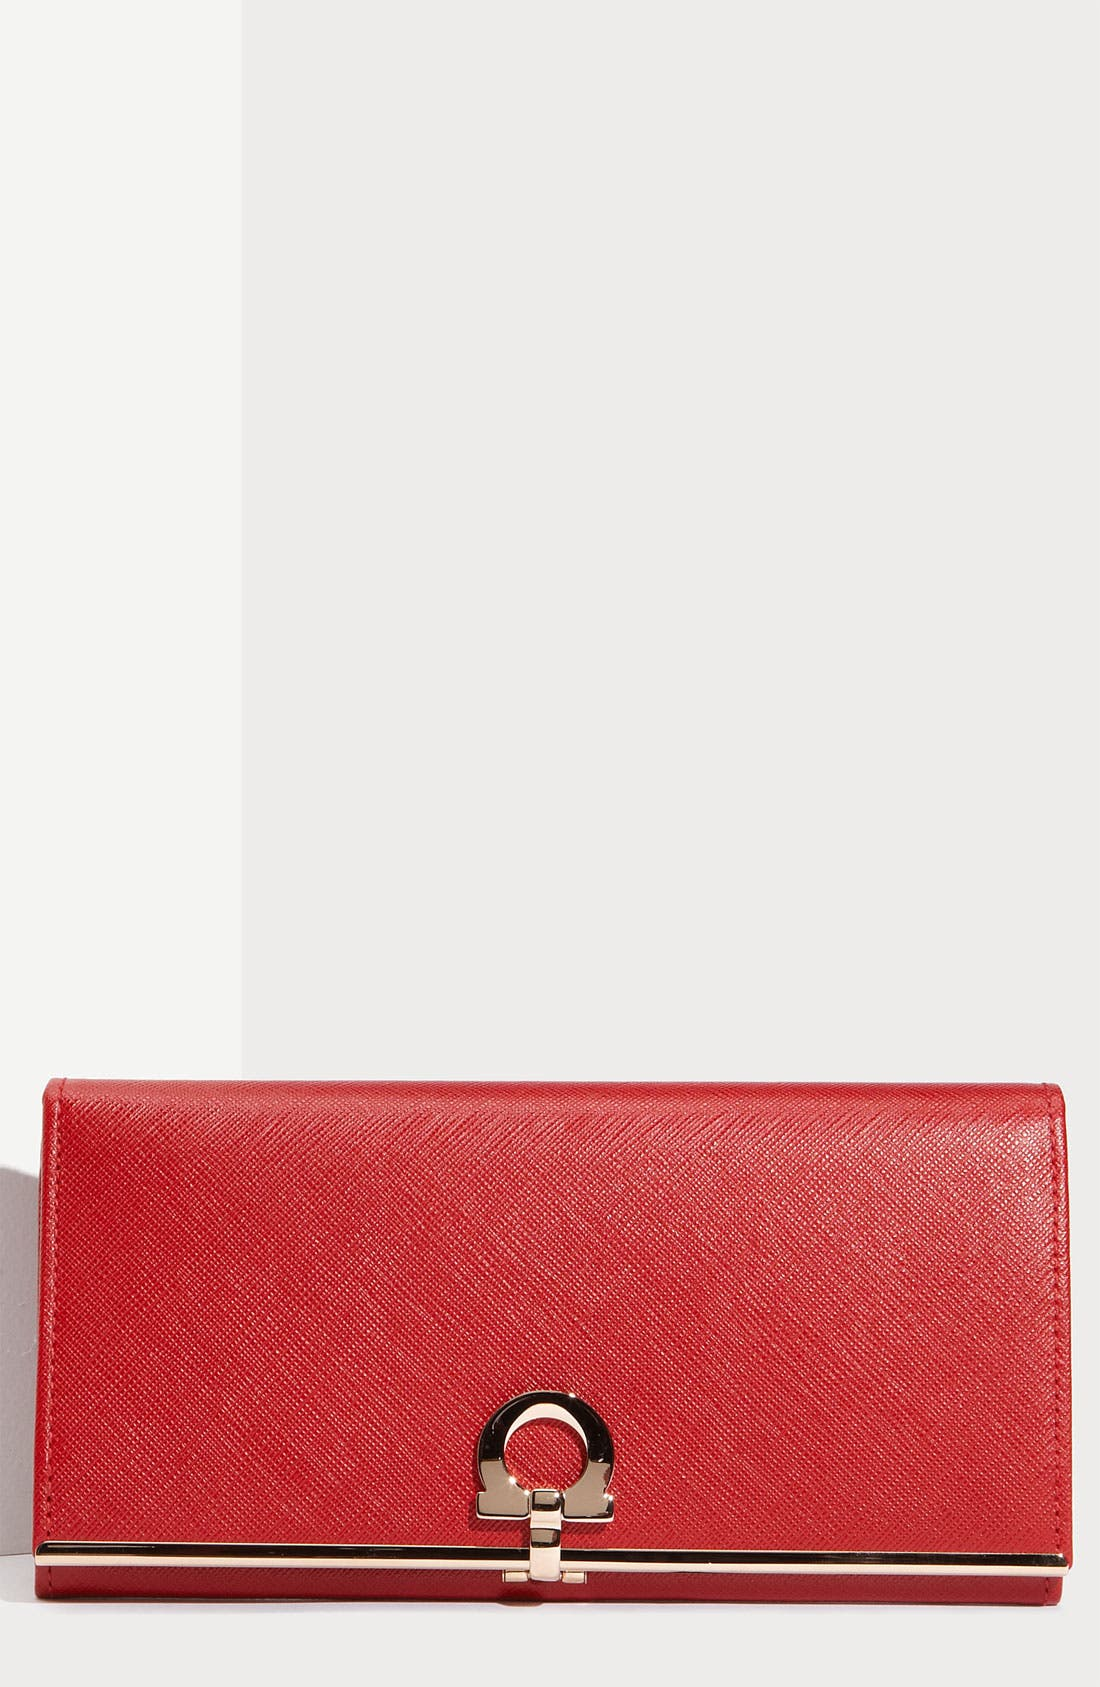 Alternate Image 1 Selected - Salvatore Ferragamo 'Gancini Icona' Saffiano Leather Wallet